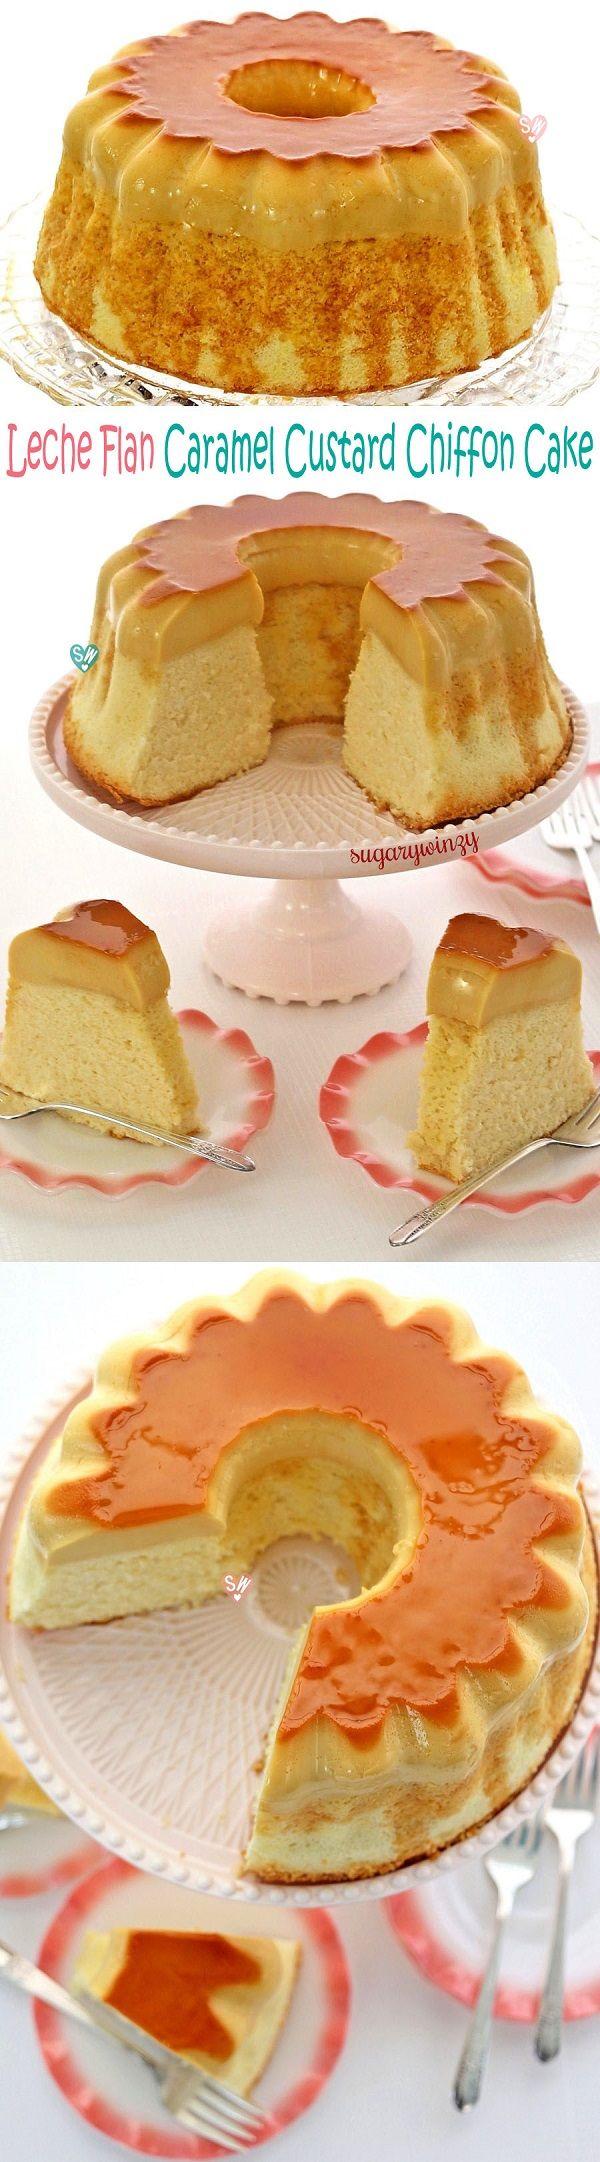 SugaryWinzy Leche Flan Caramel Custard Chiffon Cake